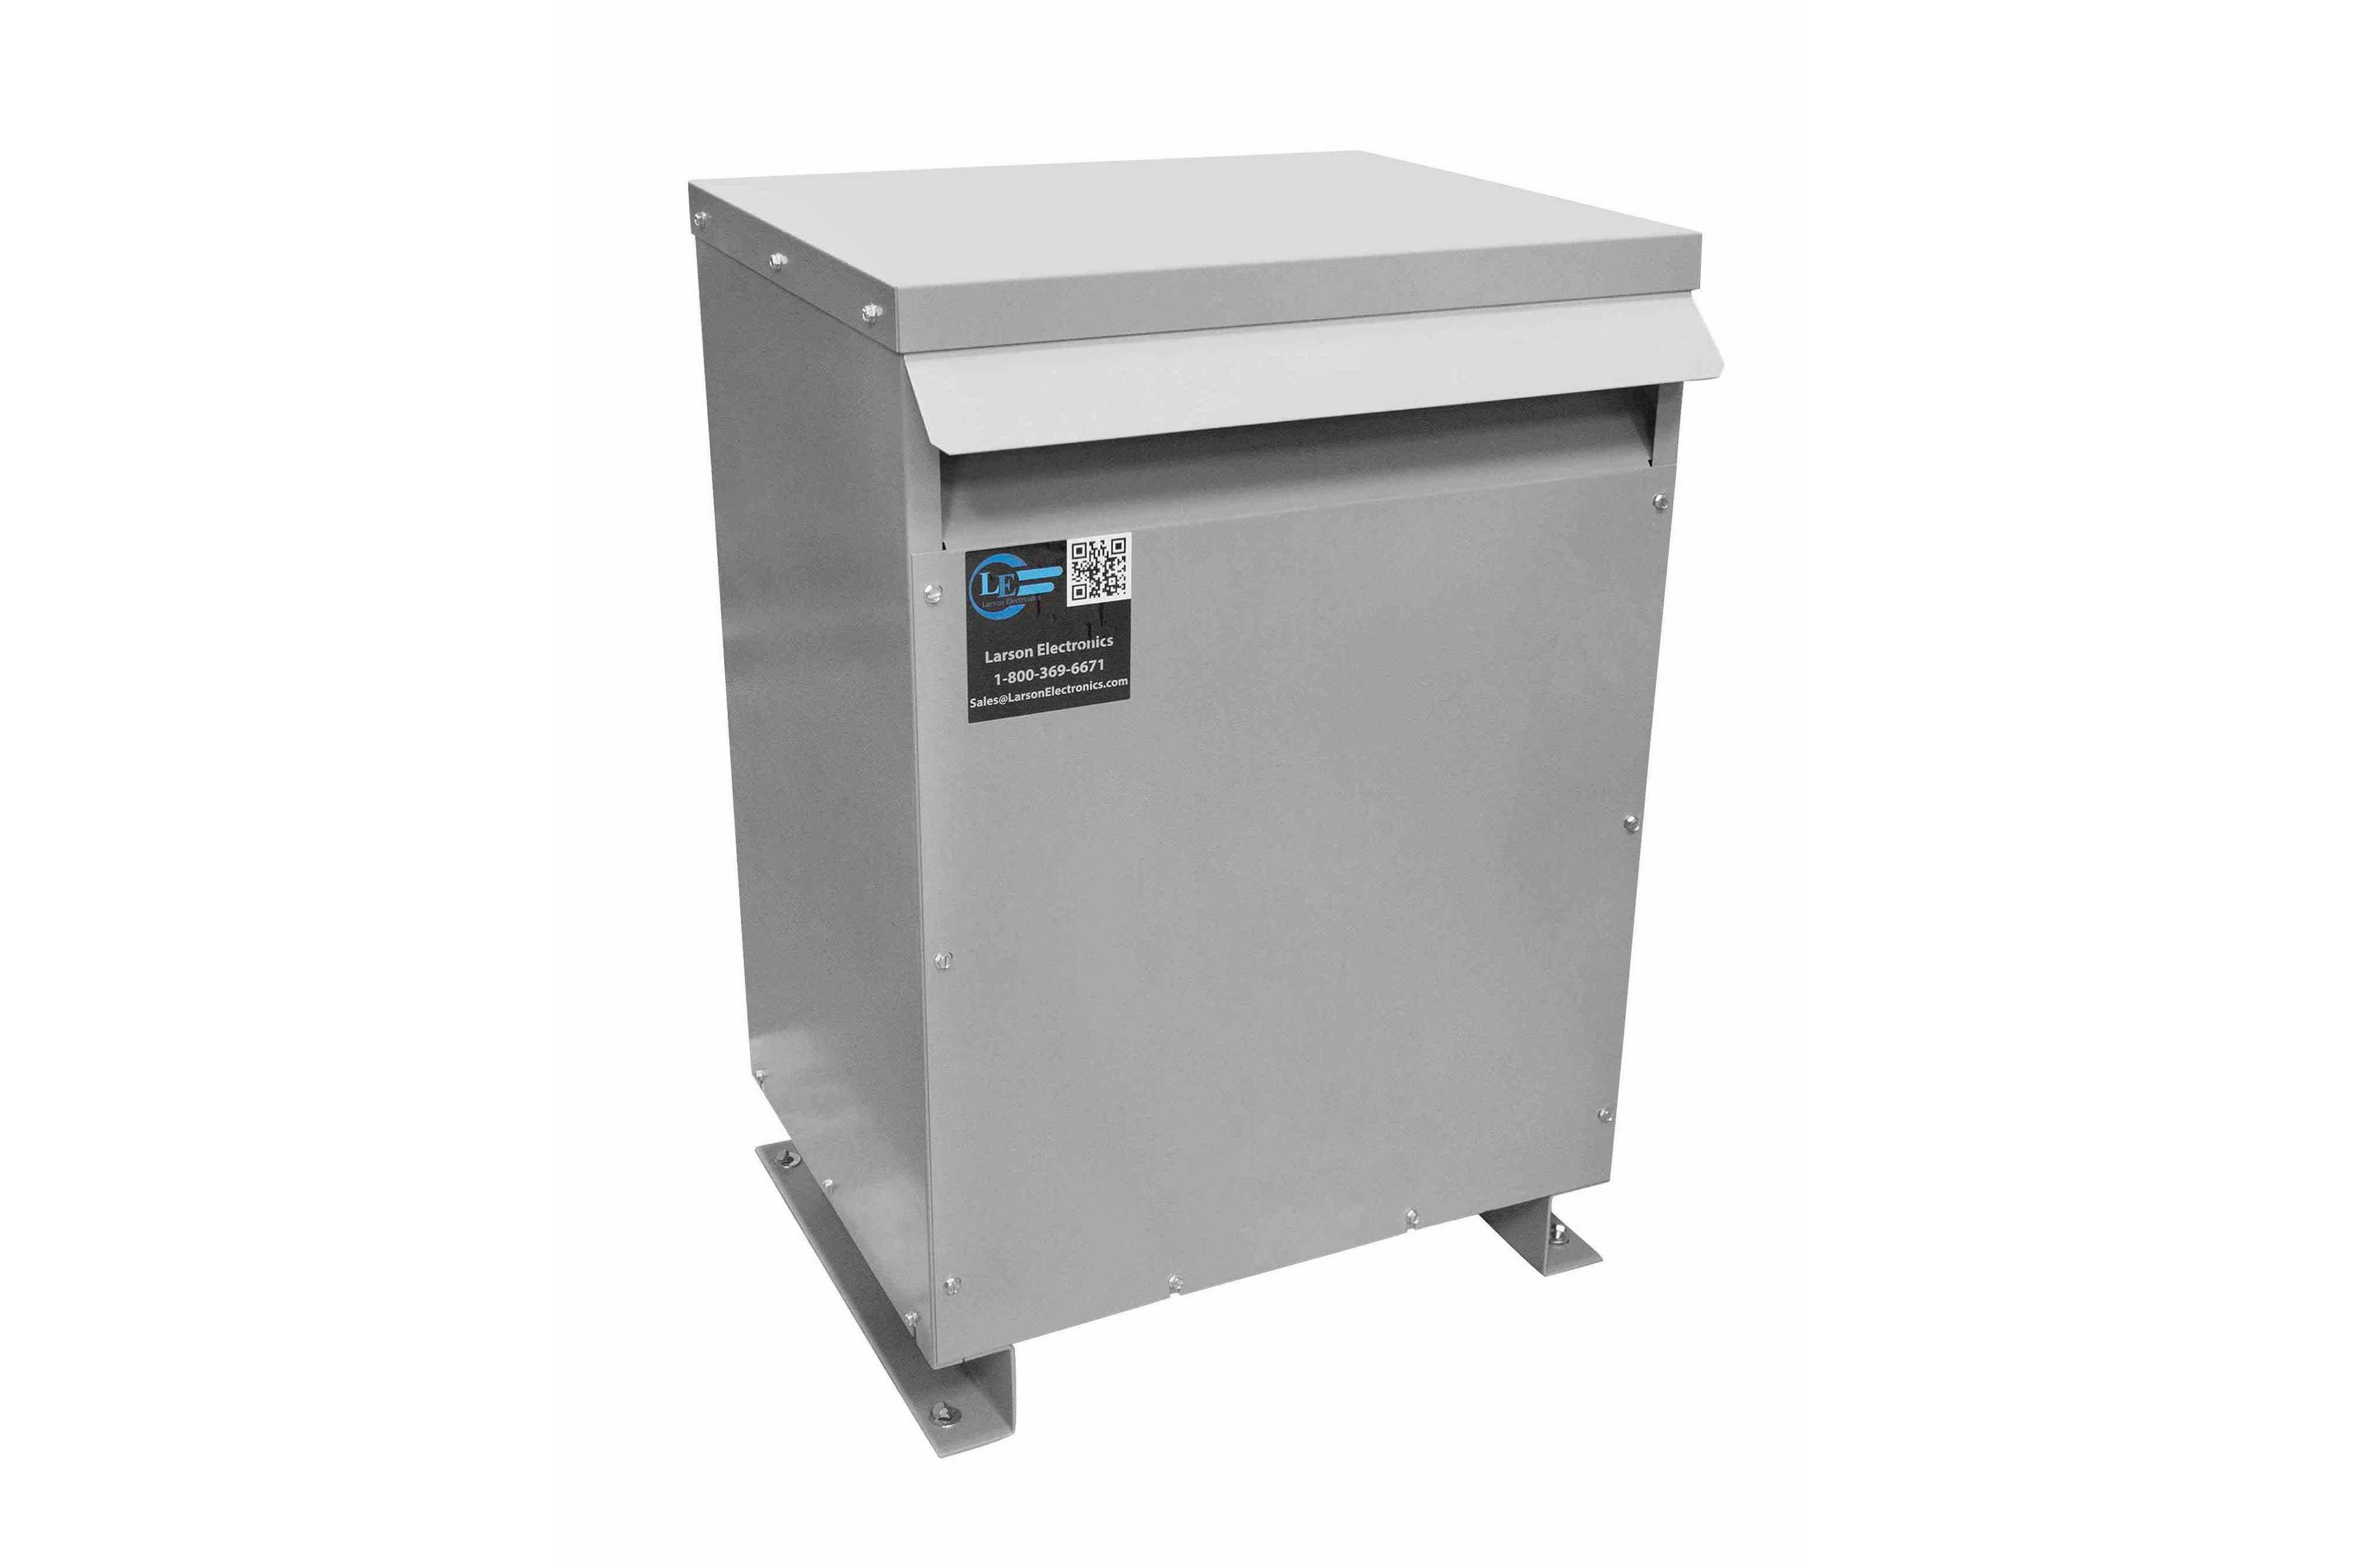 35 kVA 3PH Isolation Transformer, 400V Wye Primary, 480Y/277 Wye-N Secondary, N3R, Ventilated, 60 Hz